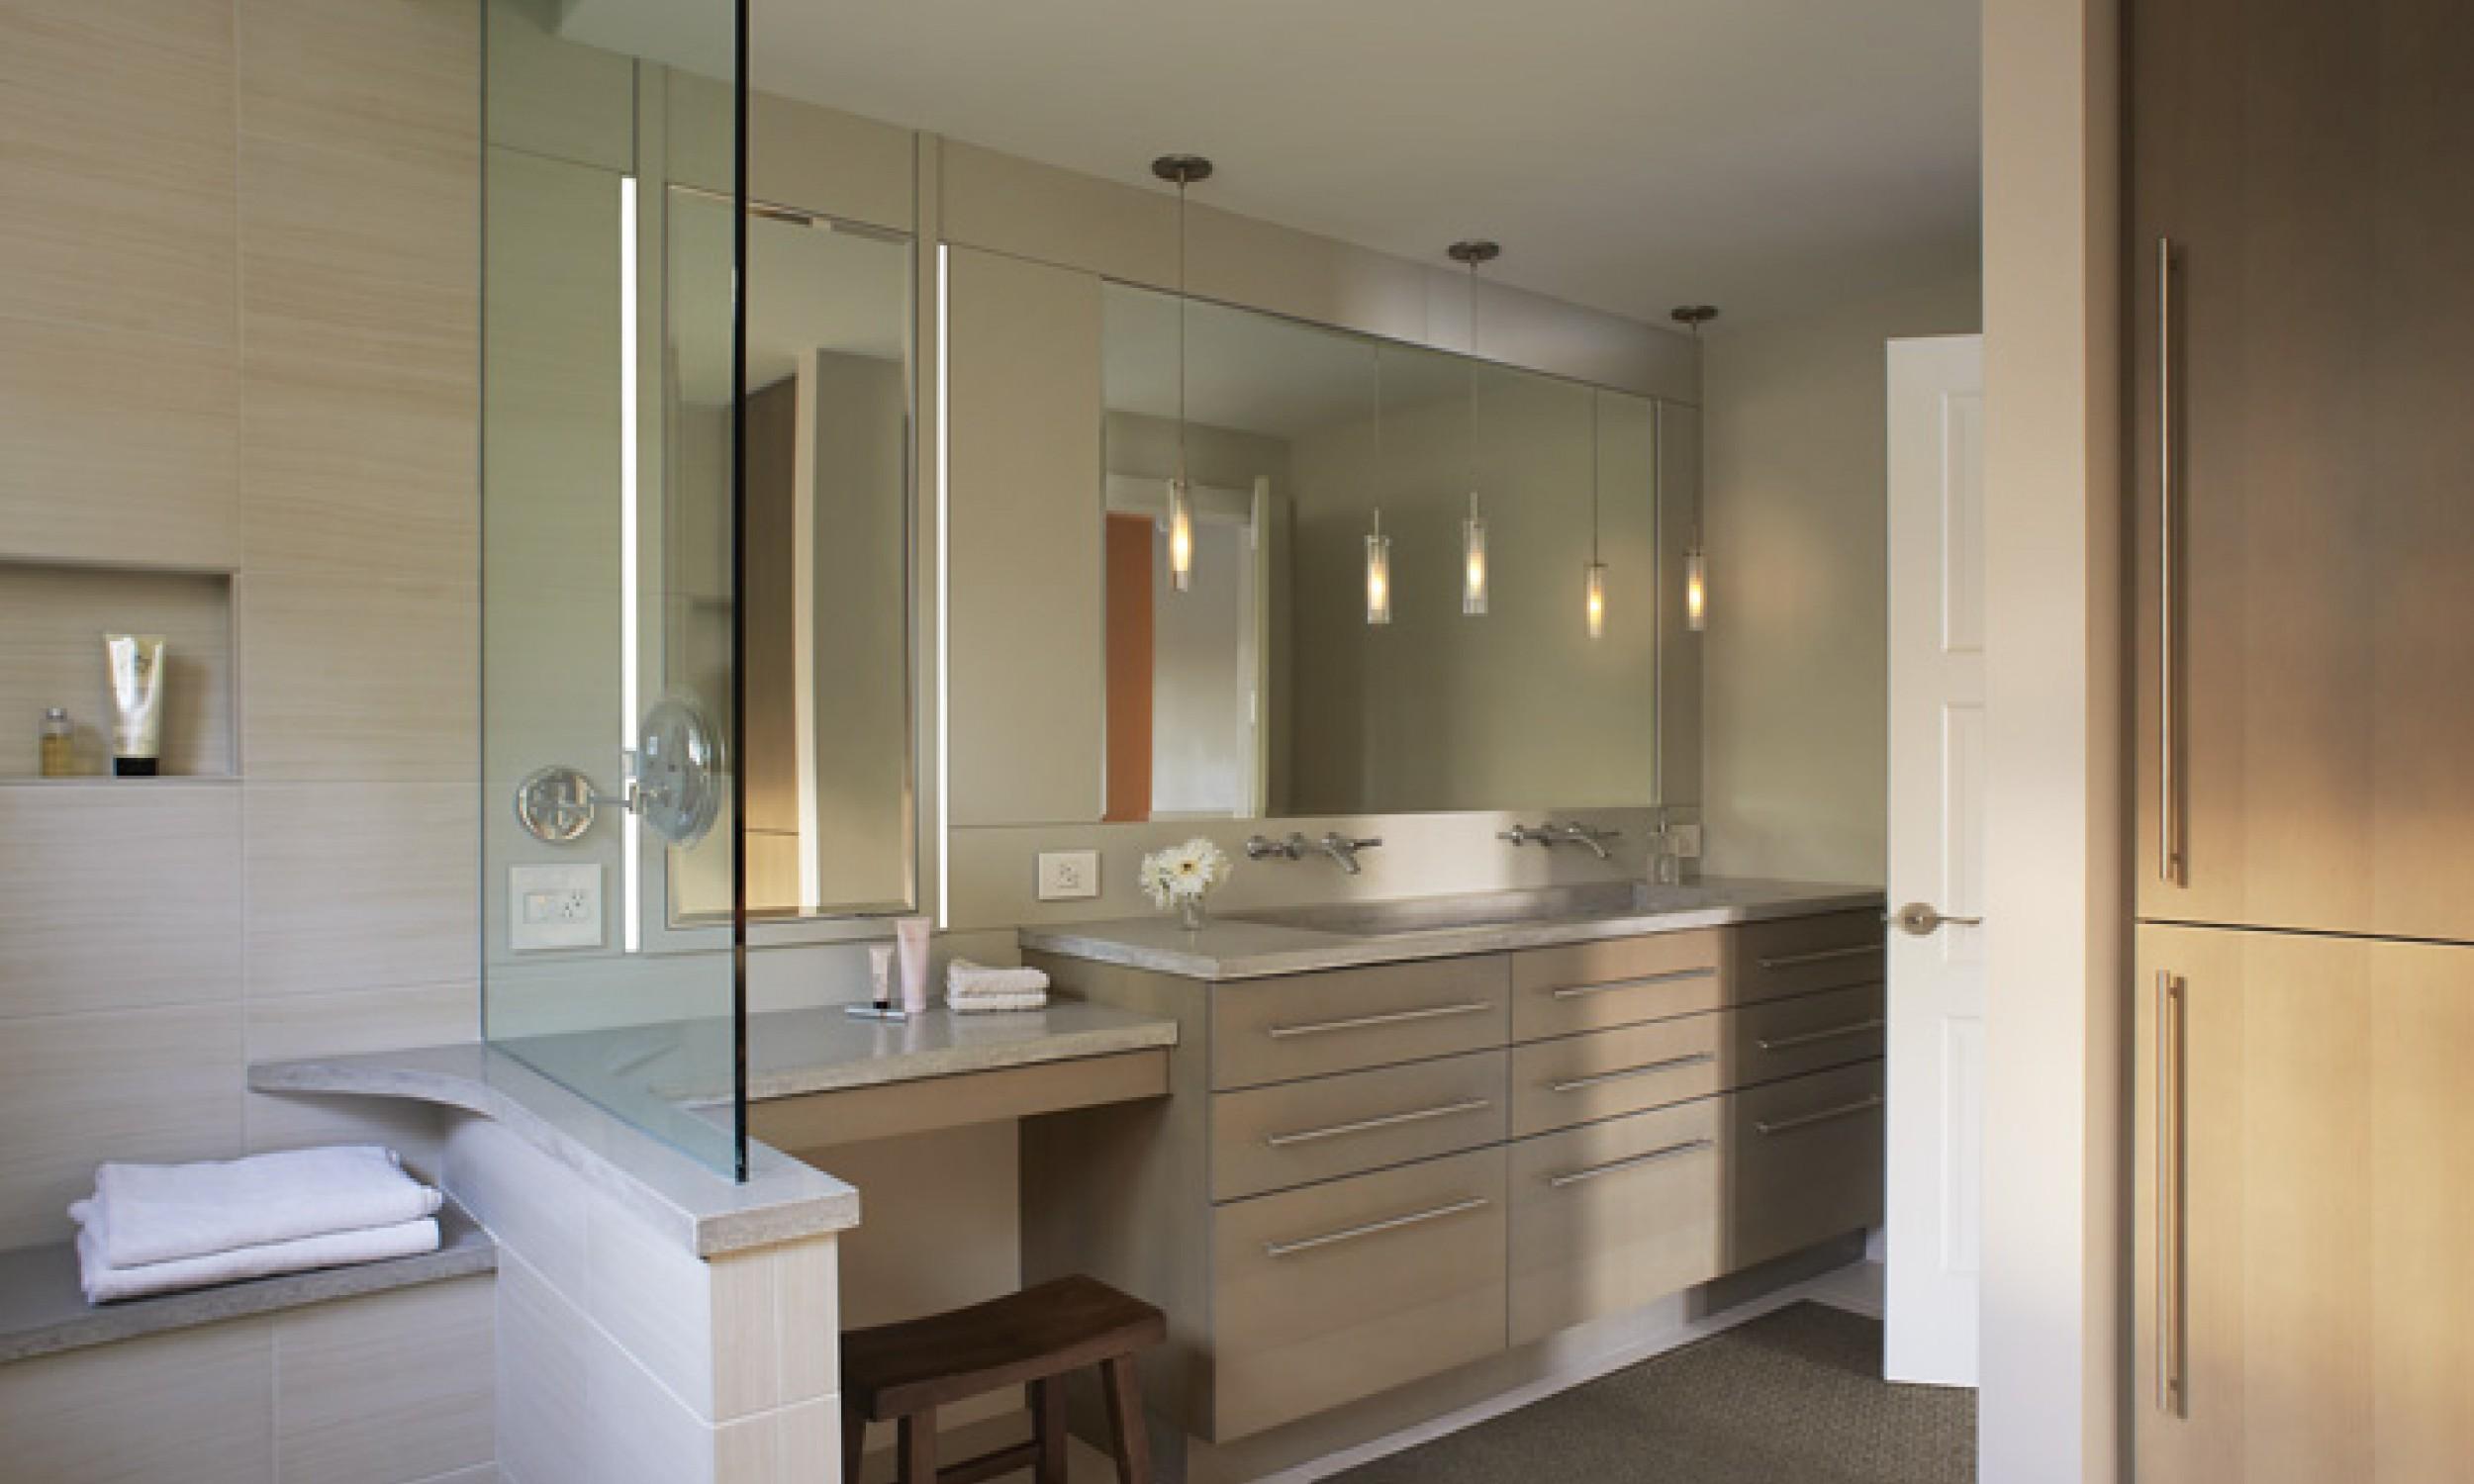 custom millwork, Glass wall, concrete counters, pendant lighting, Maine Architect, LED lighting